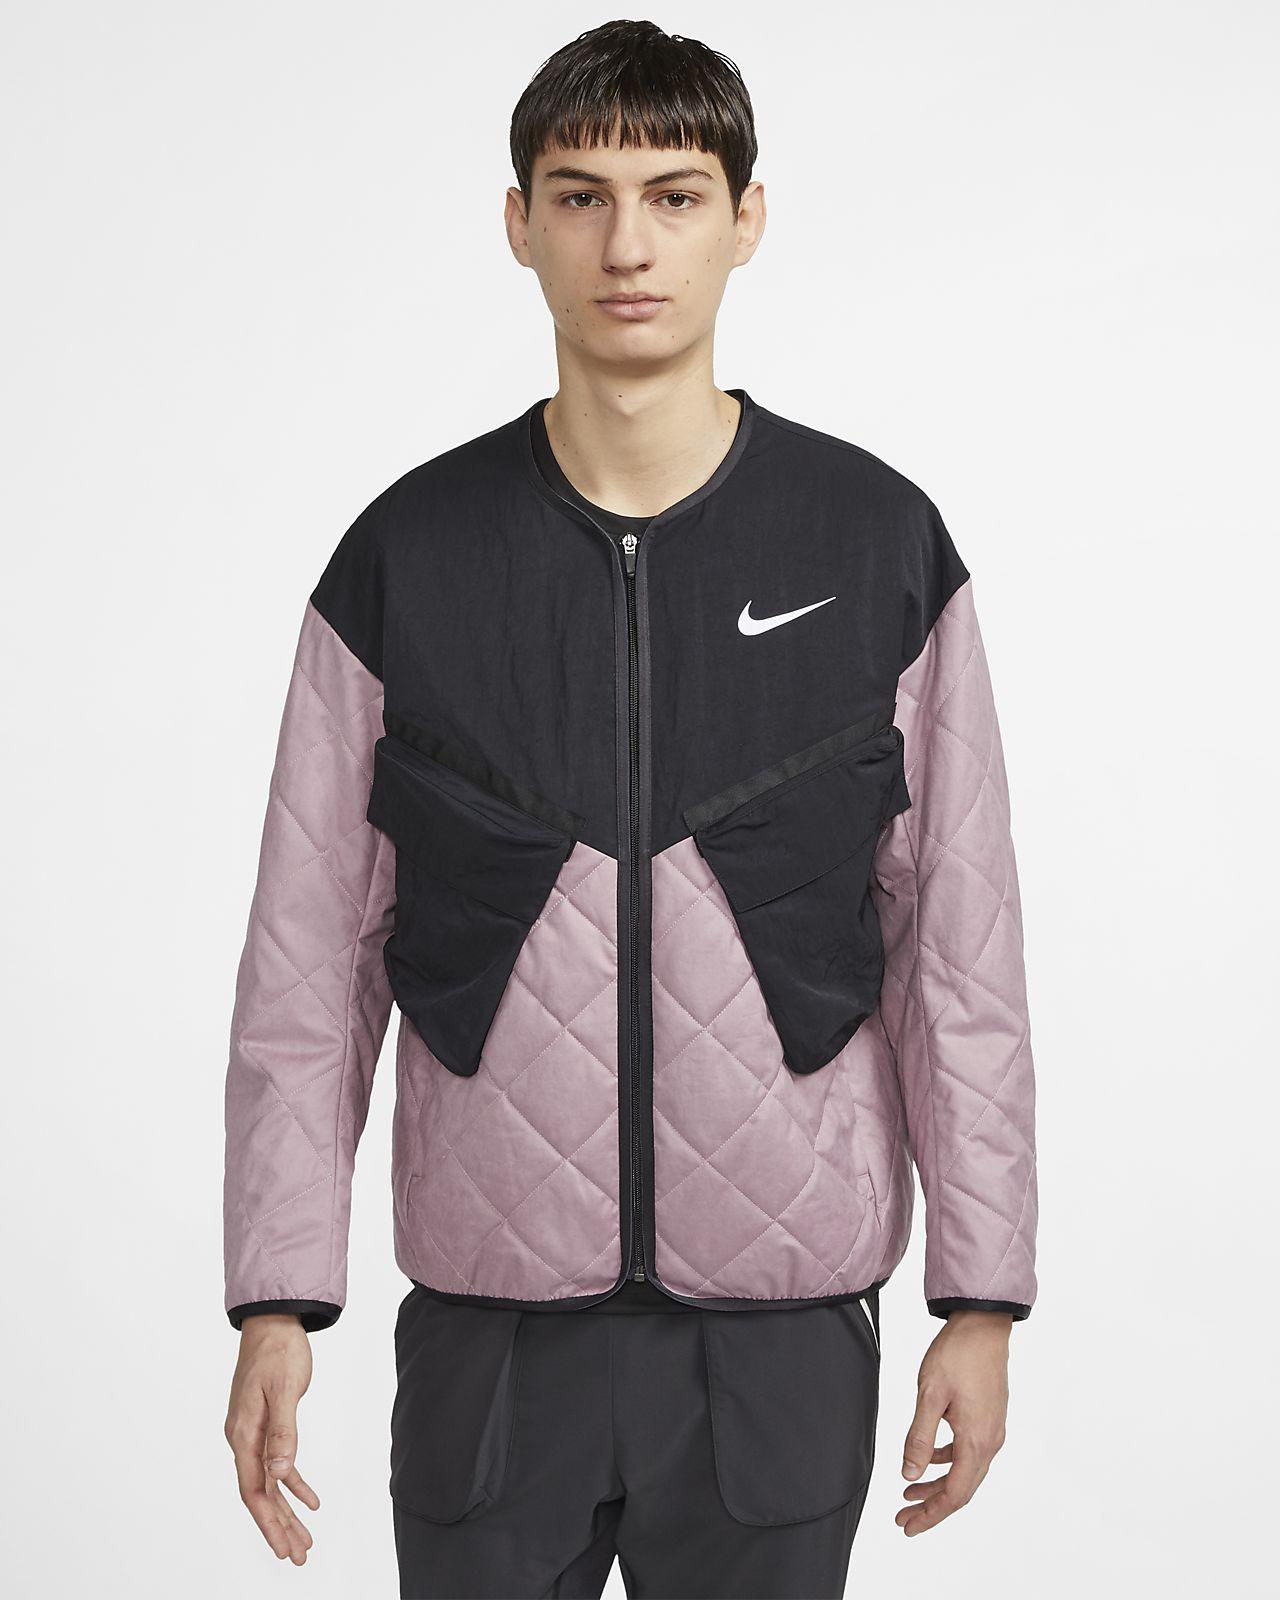 Nike Run Ready-jakke til mænd